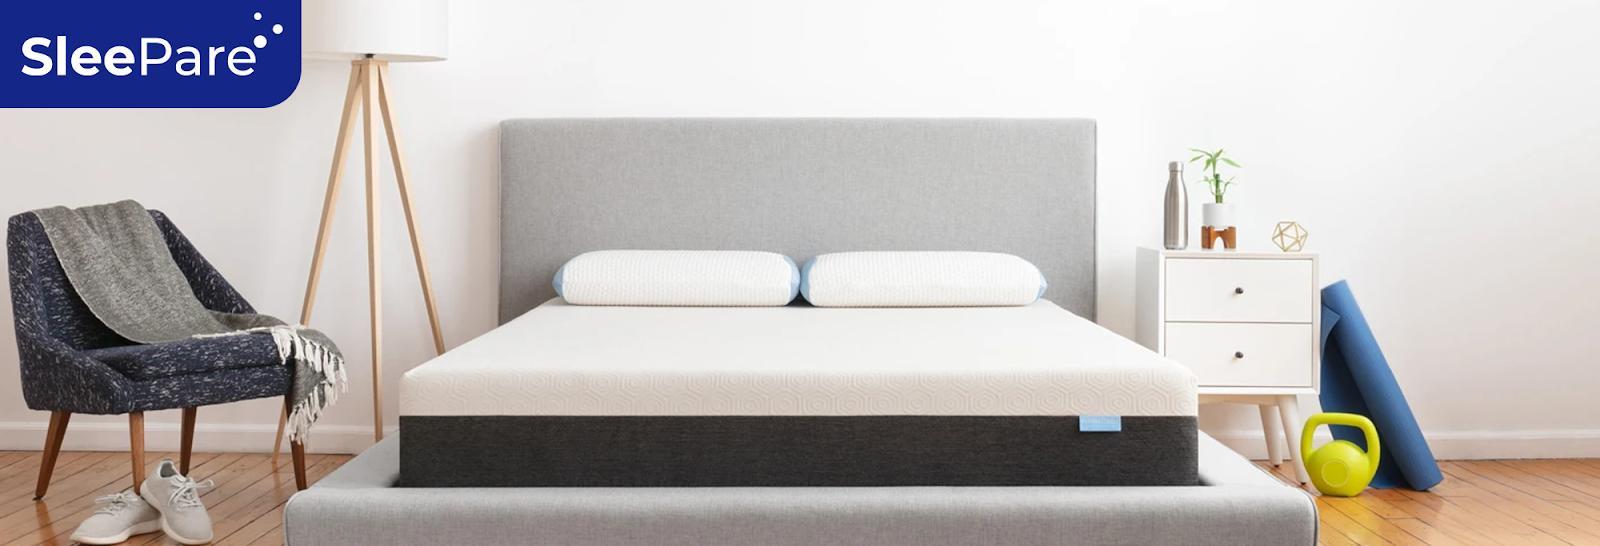 sleepare bear mattress nyc